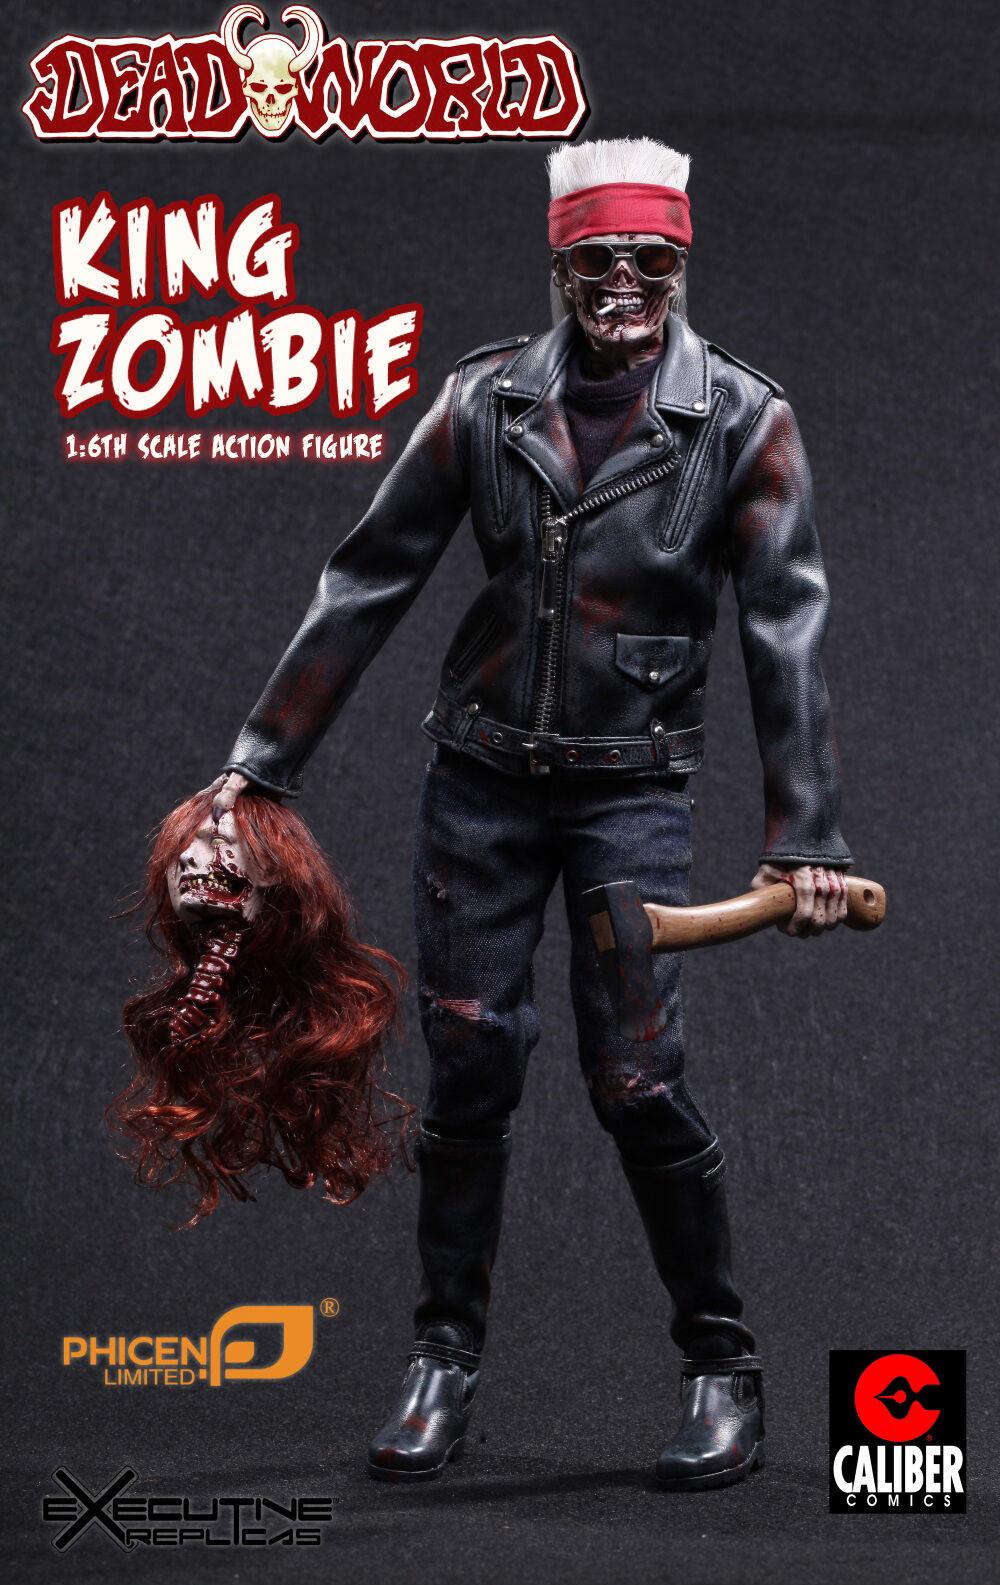 1 6 Phicen Dead World King Zombie Action Figure - Warriors figure MIB in Hand